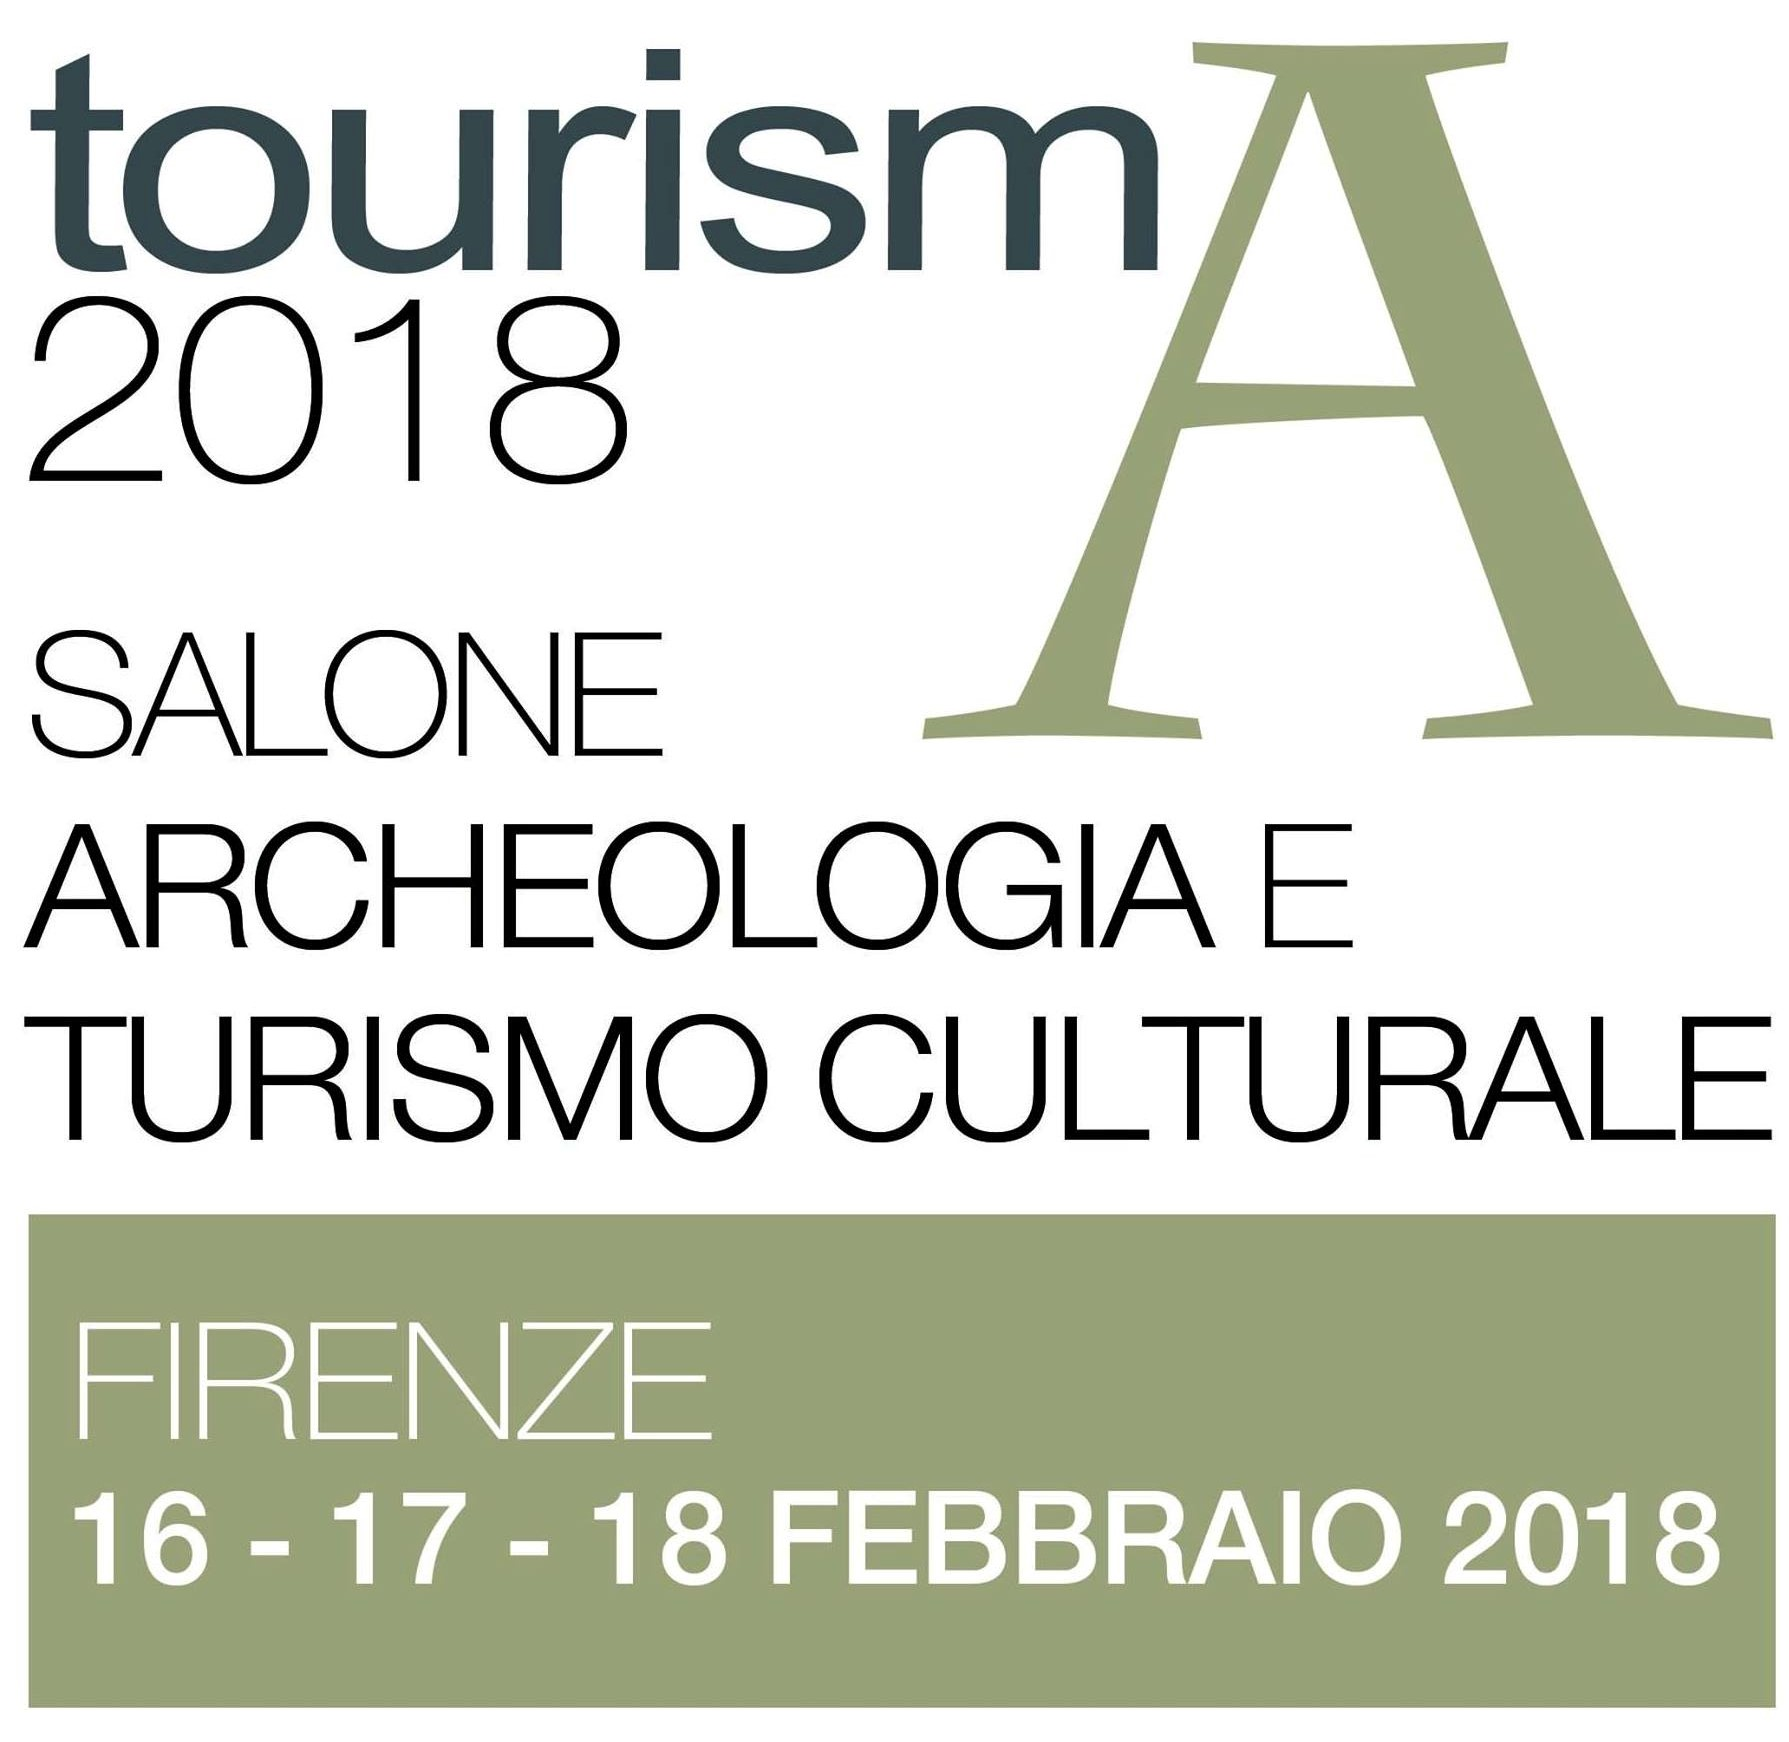 Nemzetközi Régészeti Konferencia 2018 Firenze, Palazzo dei Congressi